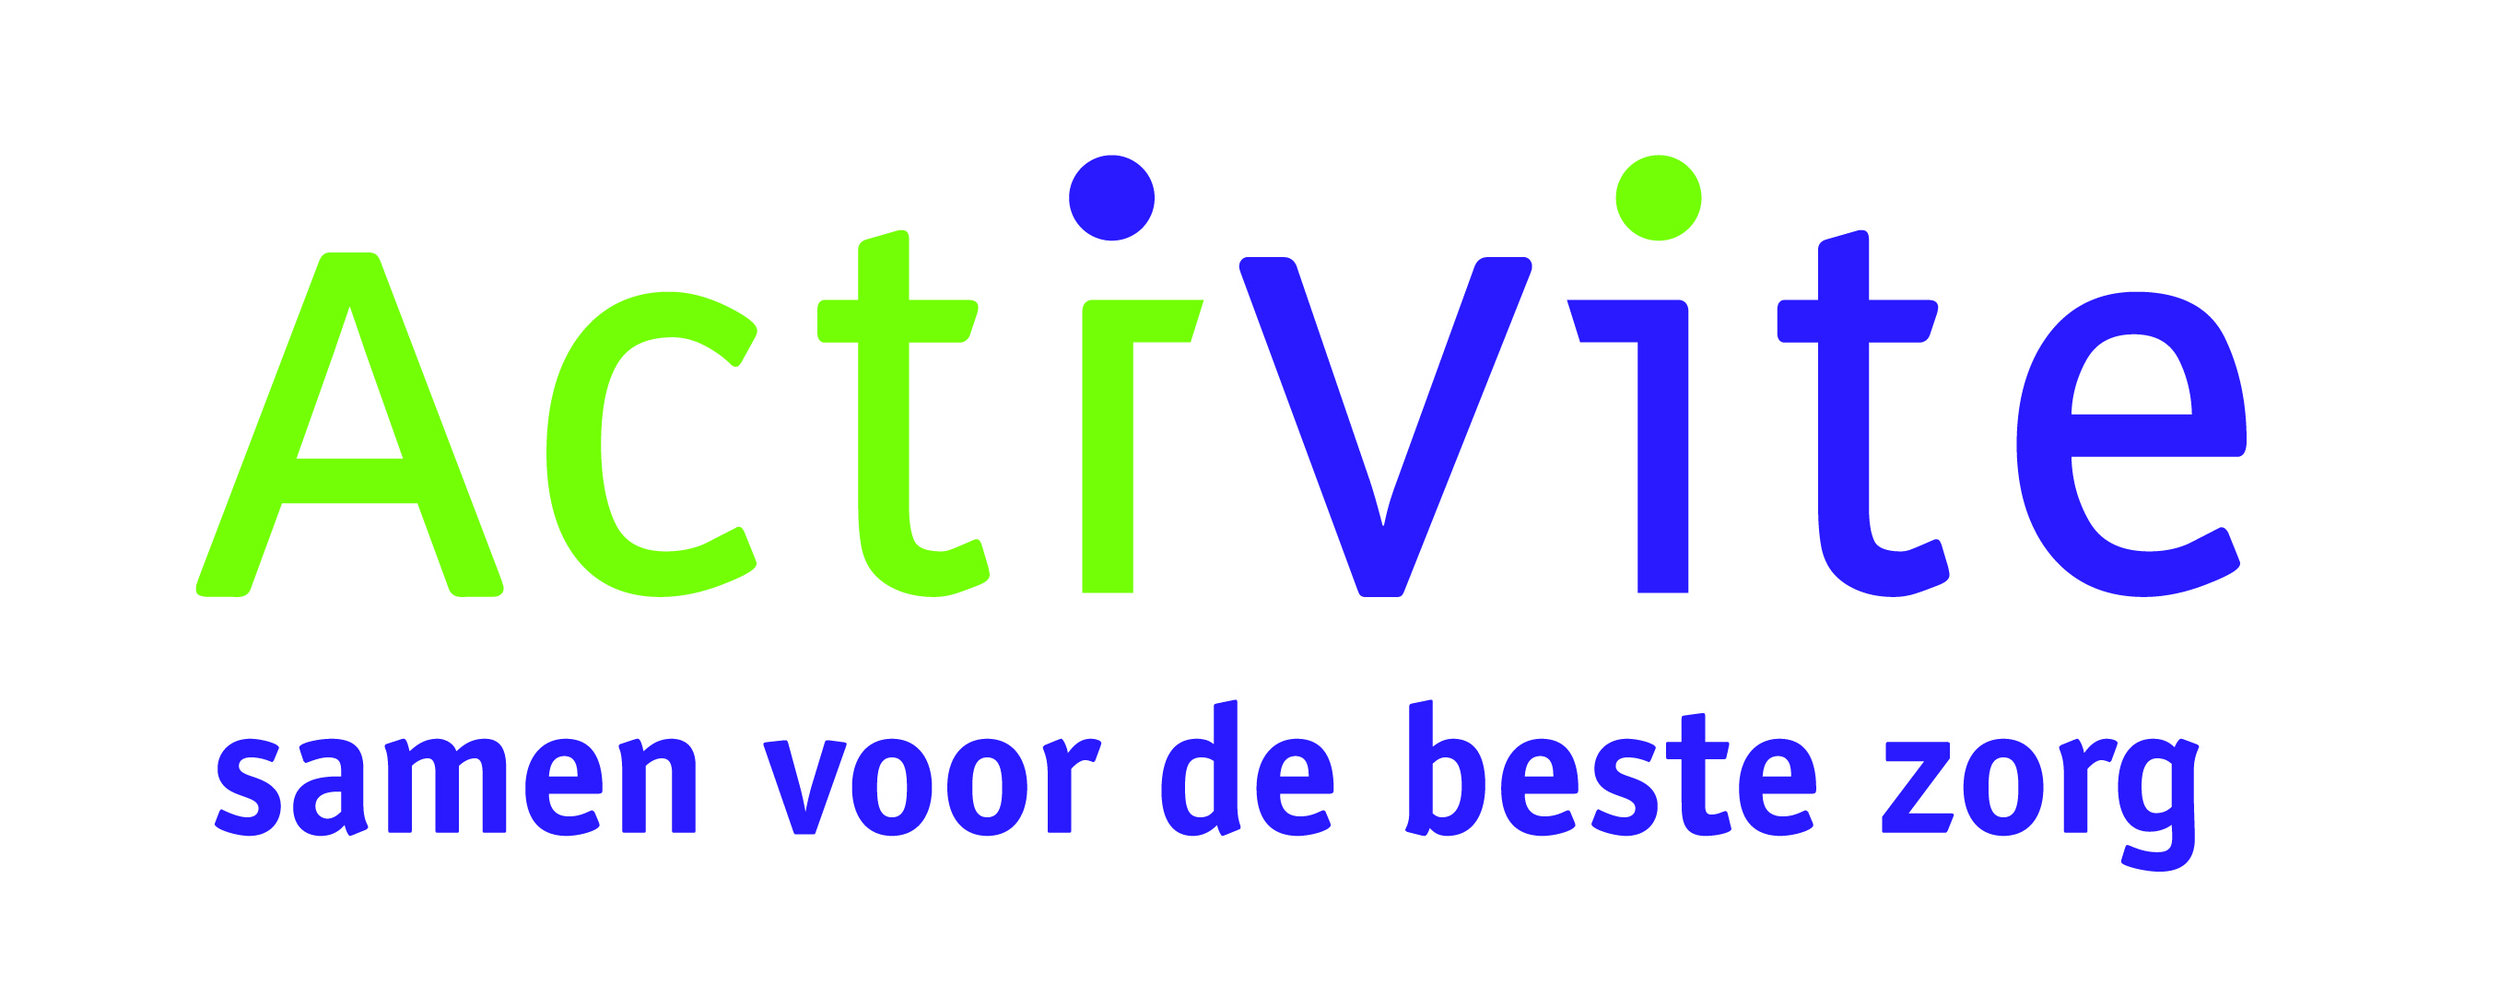 ActiVite logo coated met pay-off.jpg